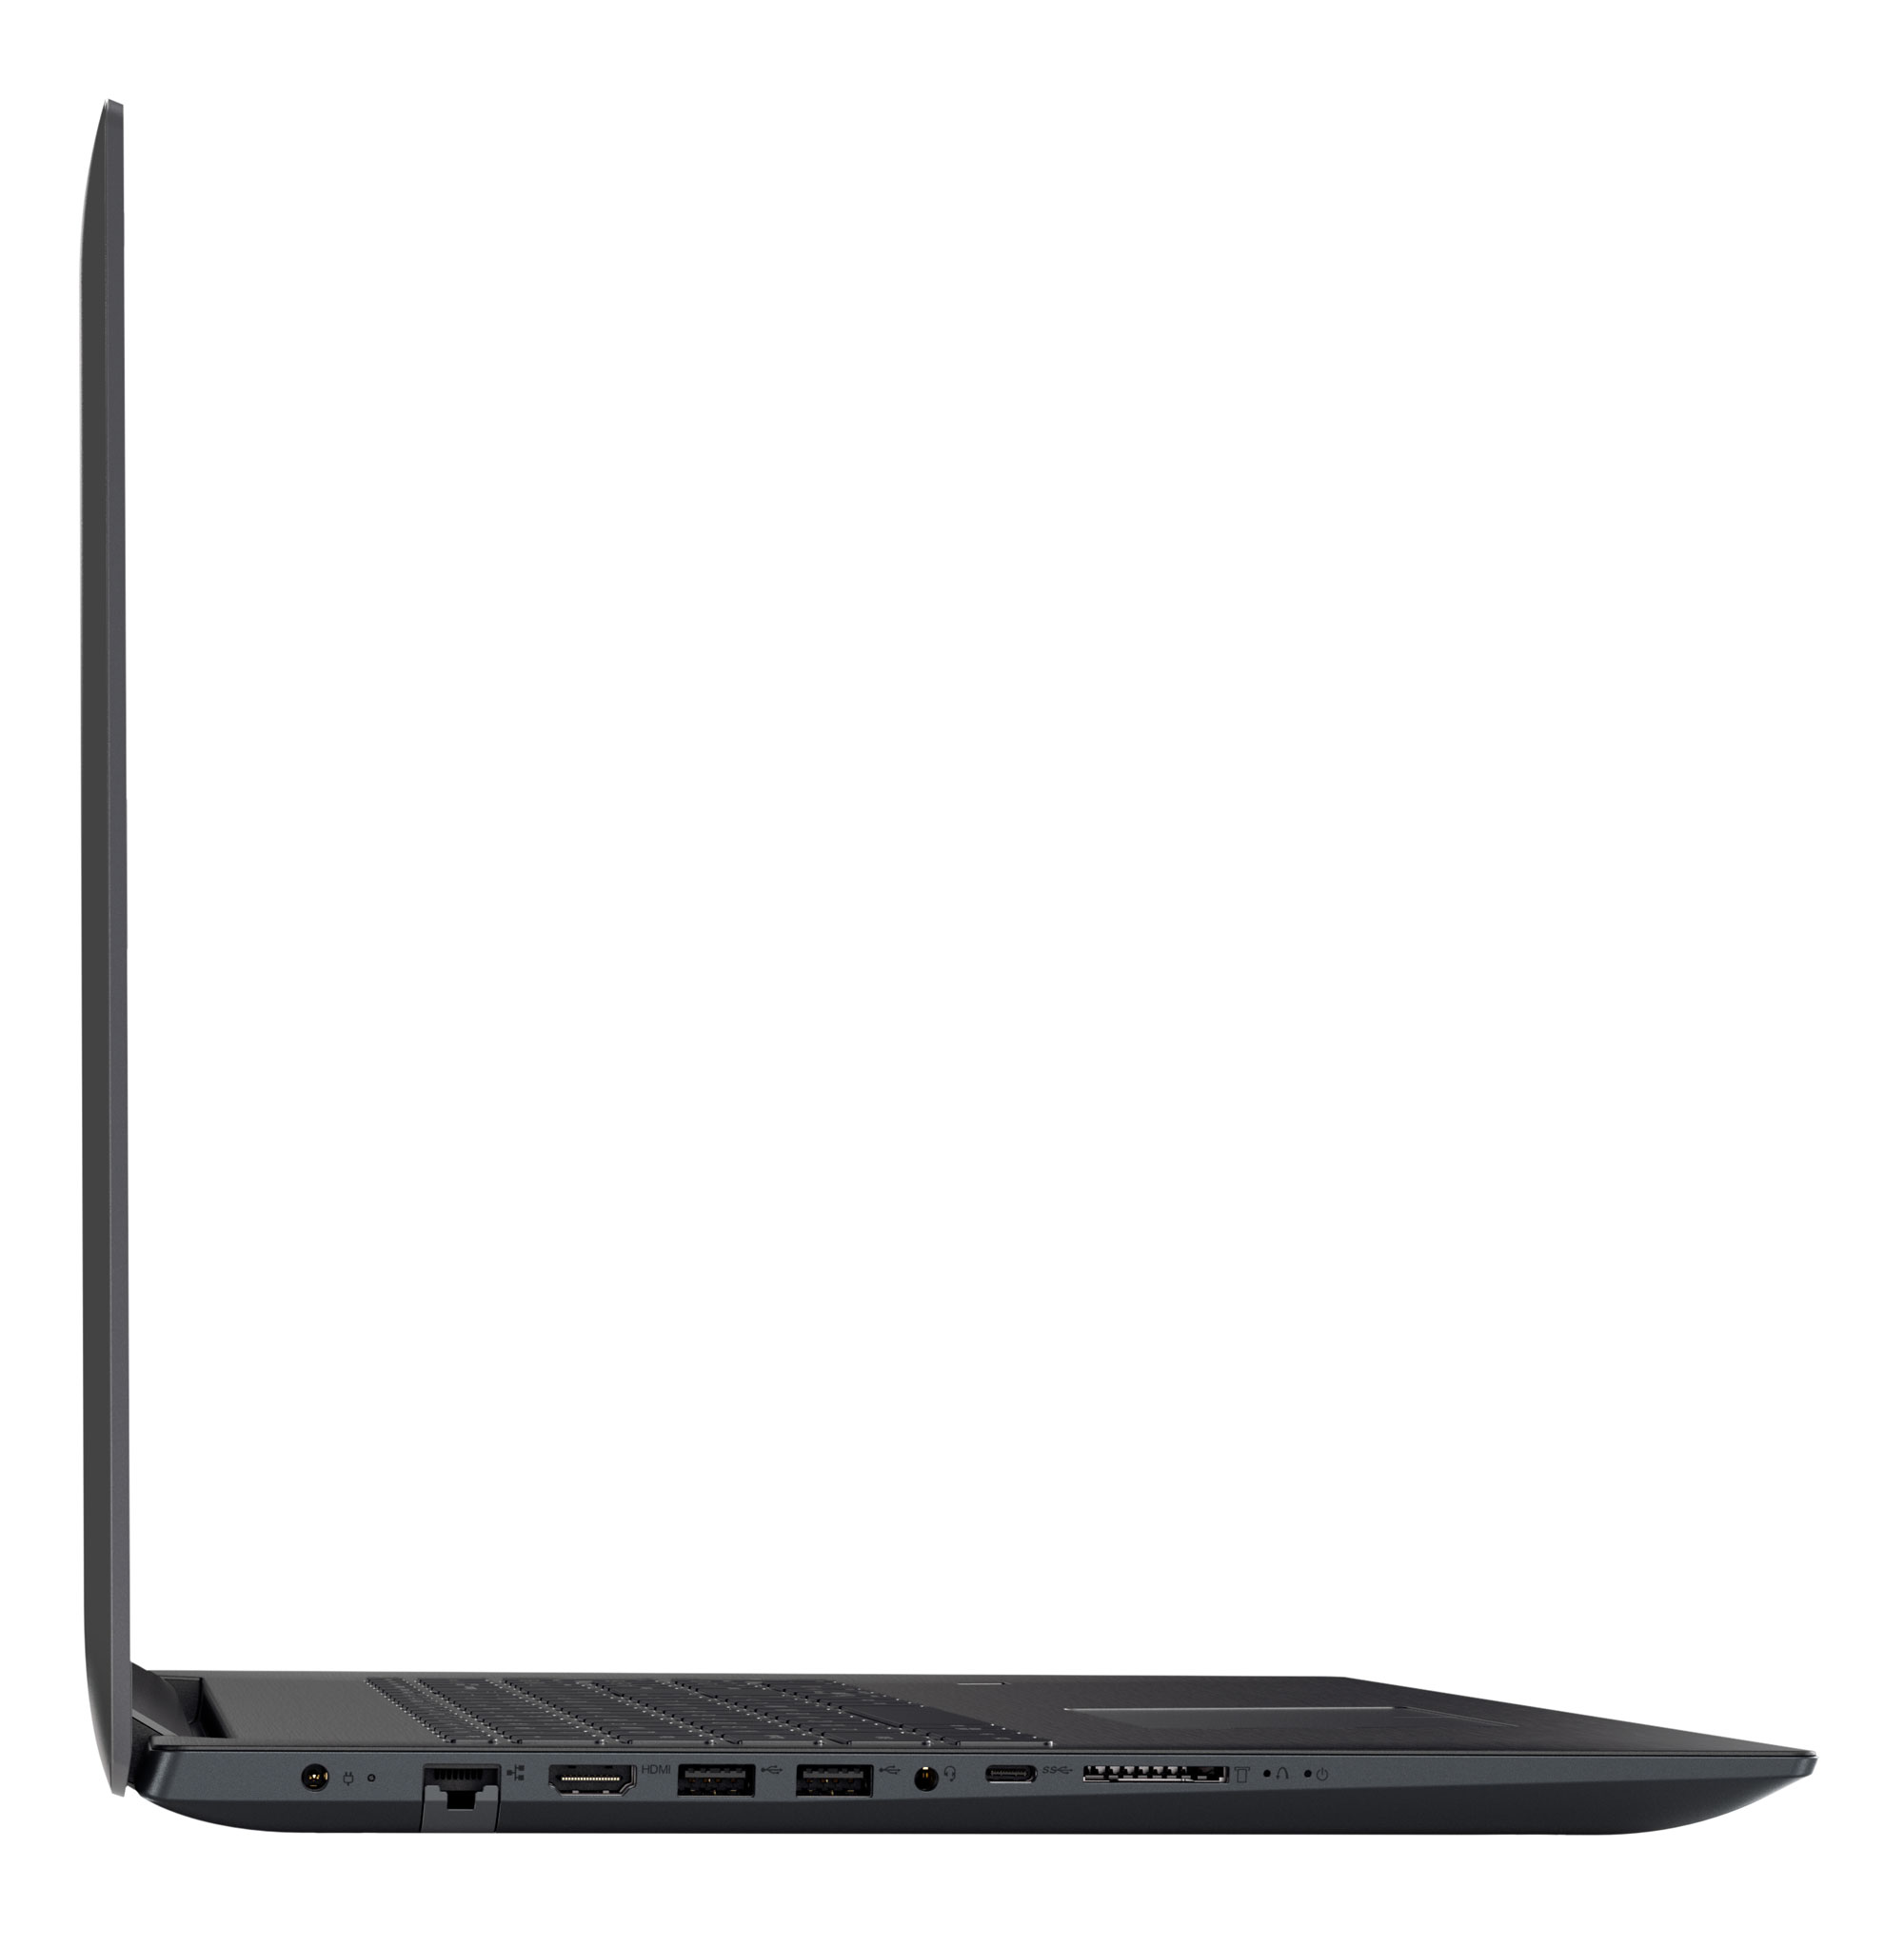 Фото  Ноутбук Lenovo V320-17IKB Iron Grey (81AH002RRA)